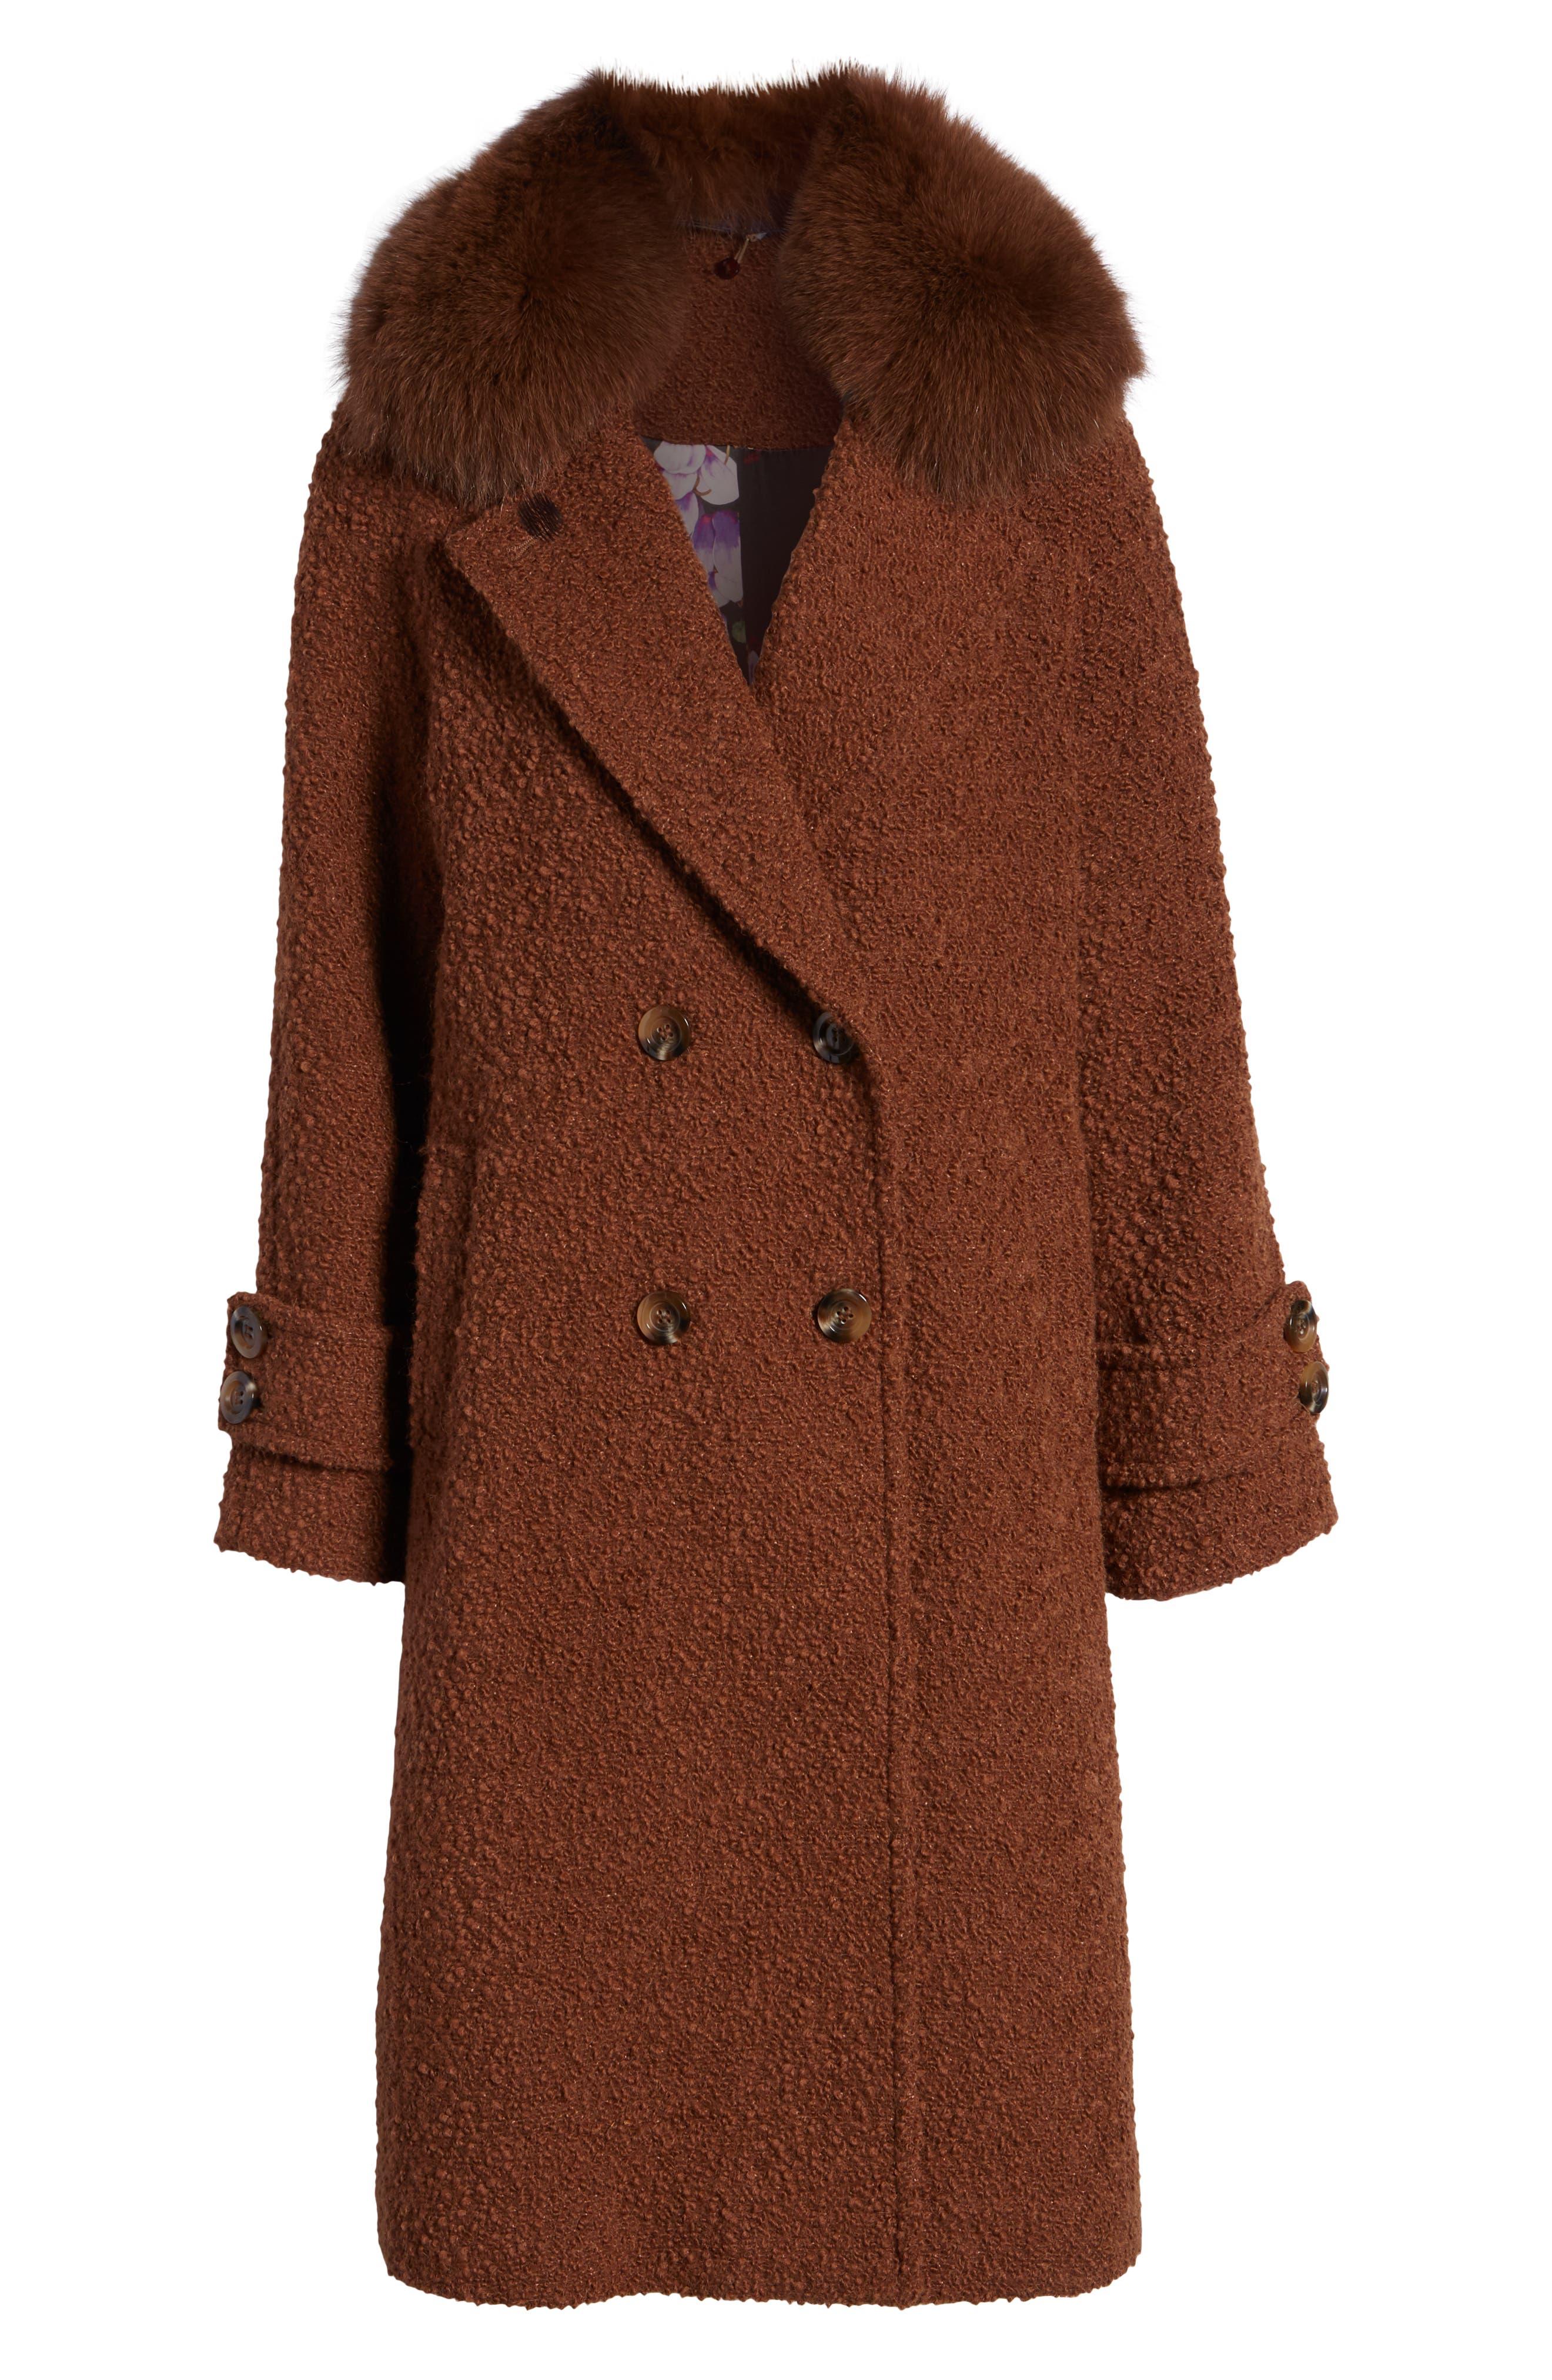 London Genuine Fox Fur Trim Long Coat,                             Alternate thumbnail 6, color,                             MOCHA